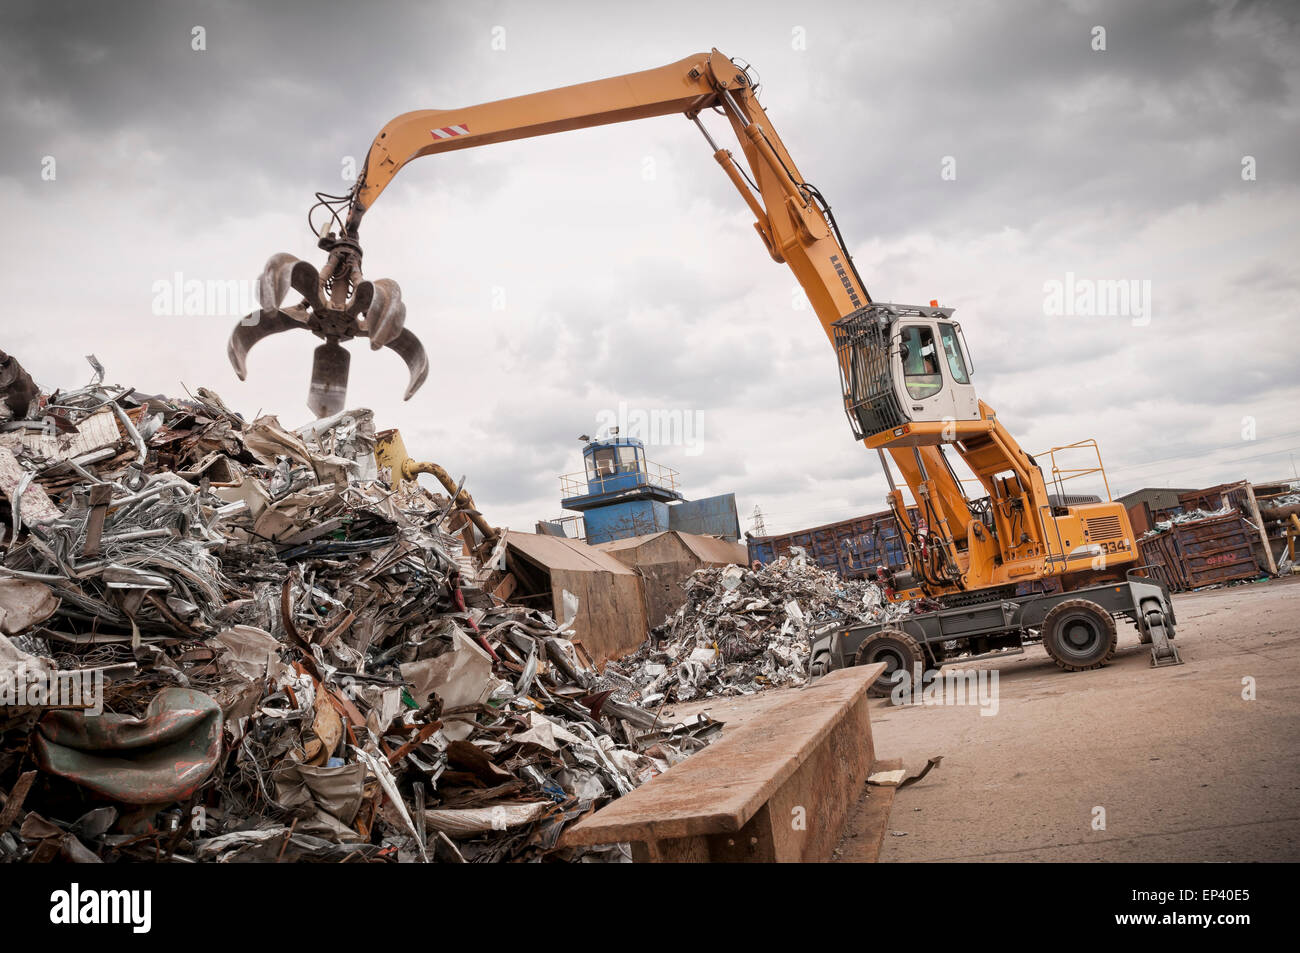 Metal recycling yard - Stock Image